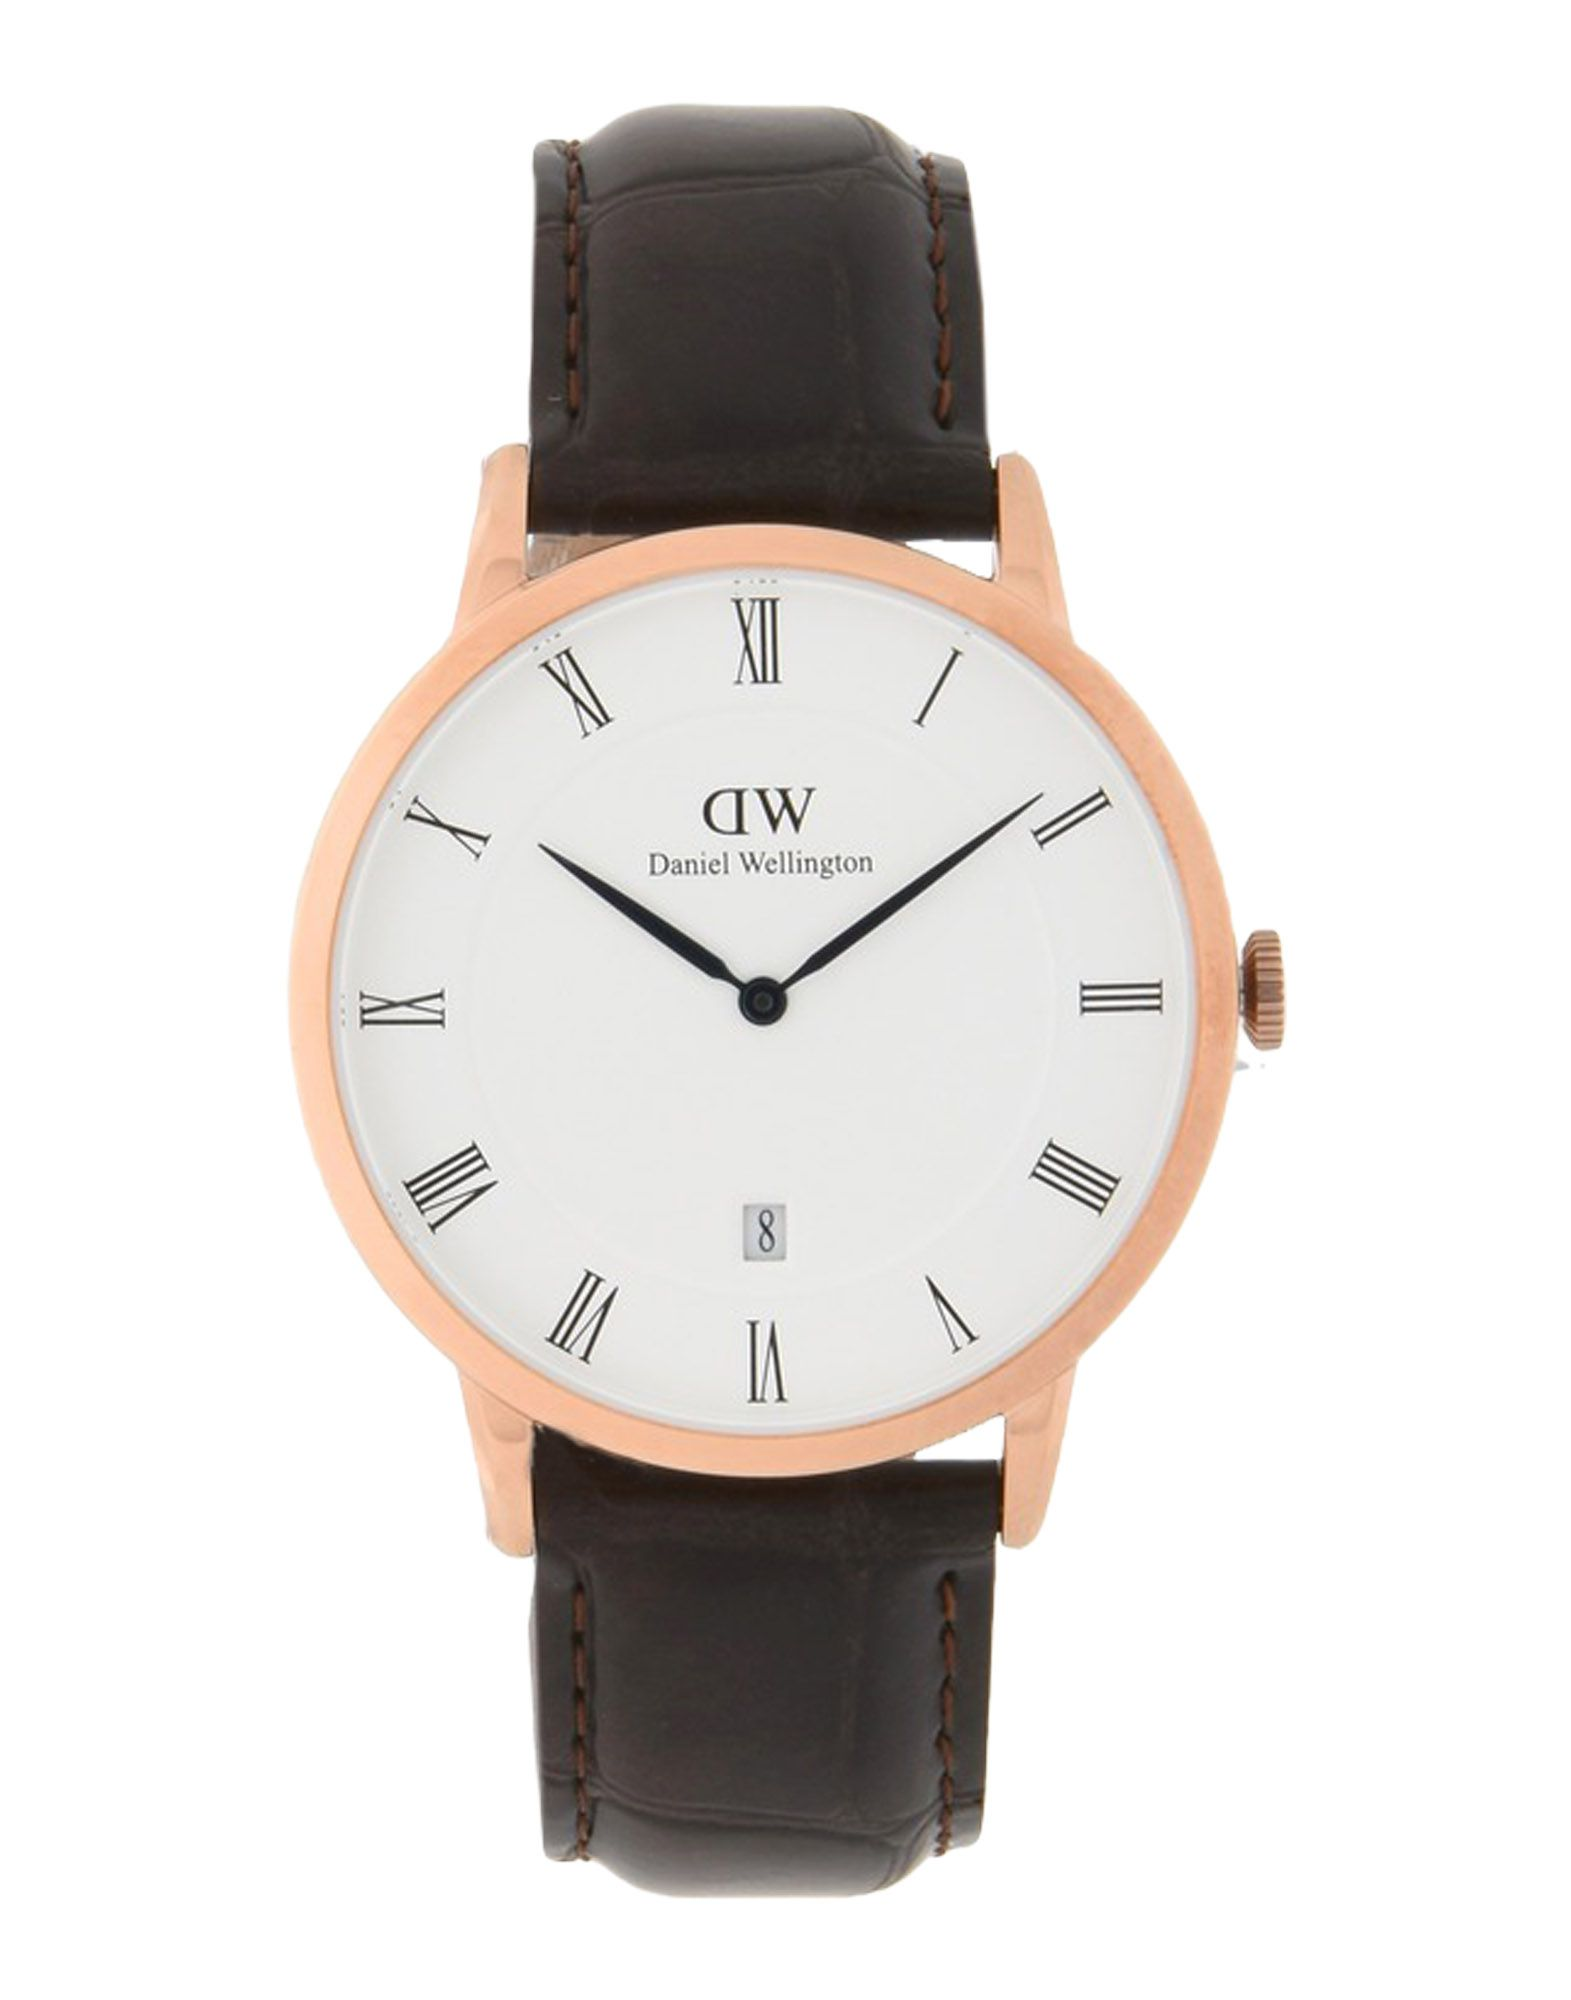 DANIEL WELLINGTON Наручные часы daniel wellington часы daniel wellington 0112dw коллекция exeter